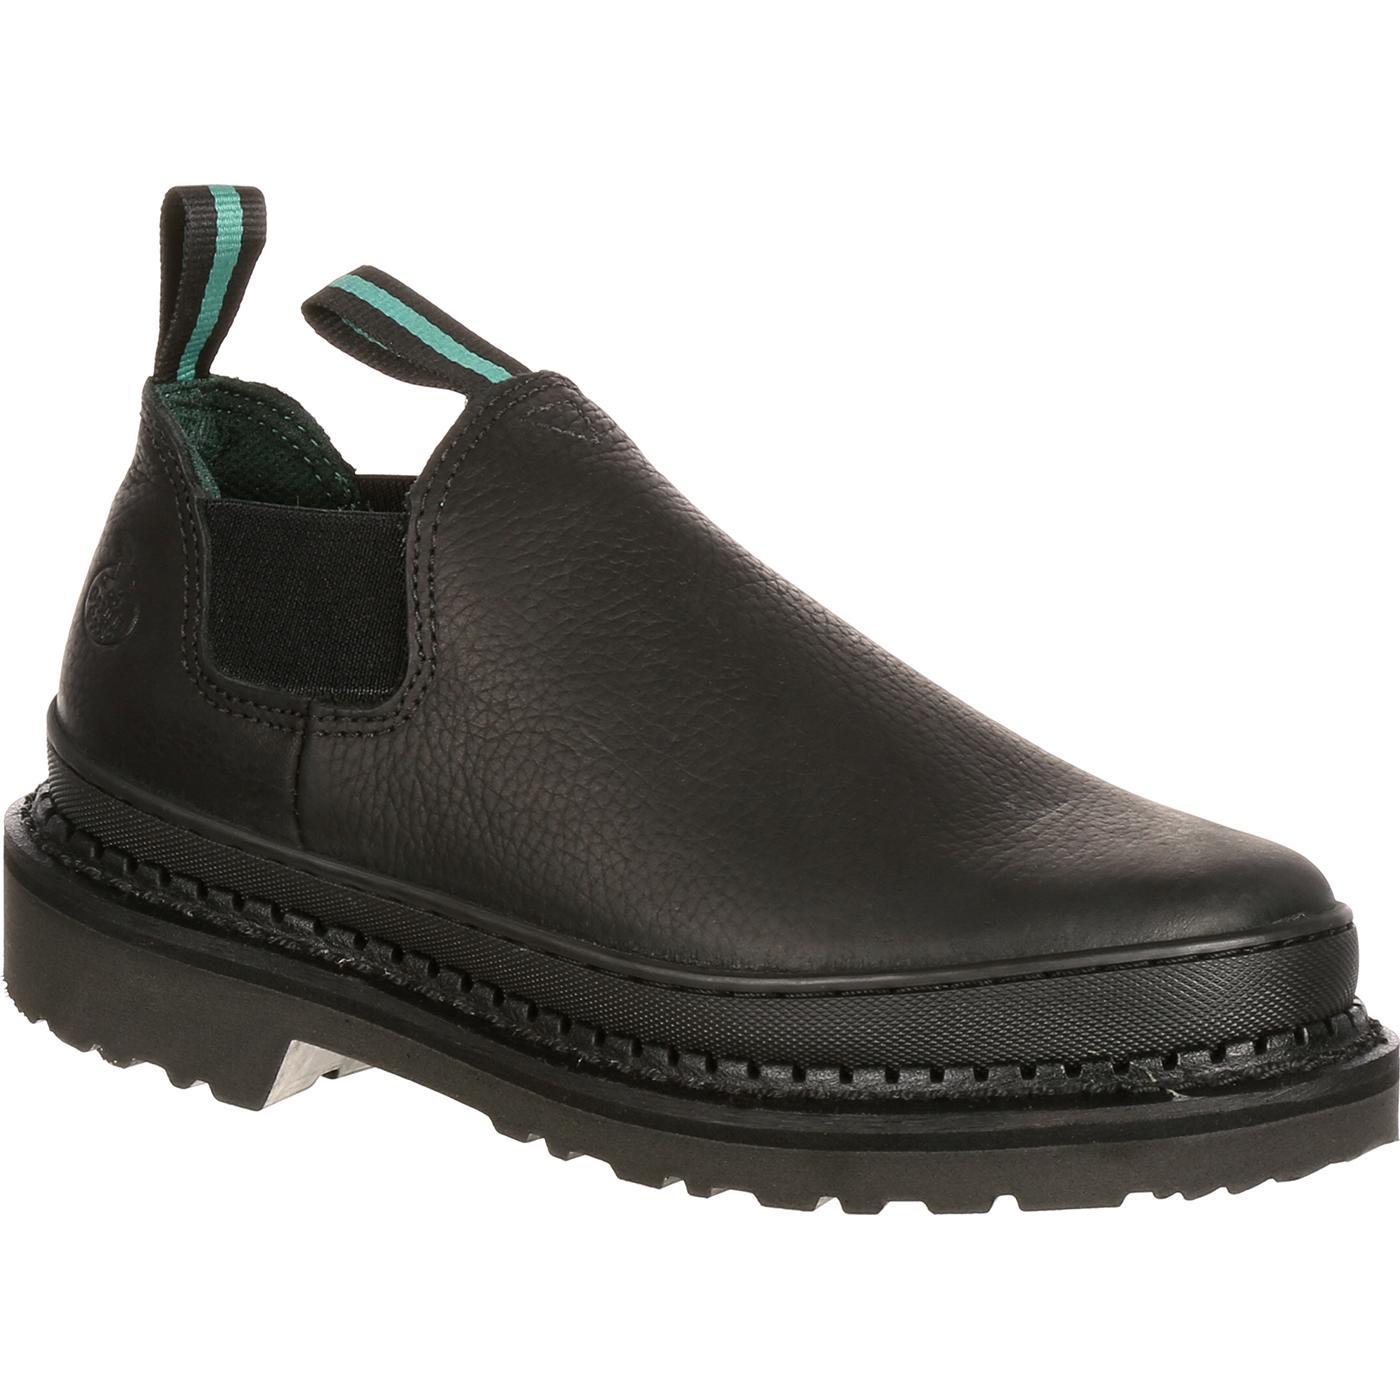 2aad88e8983f8 Georgia Giant  Men s Black Leather Slip-On Romeo Work Shoes